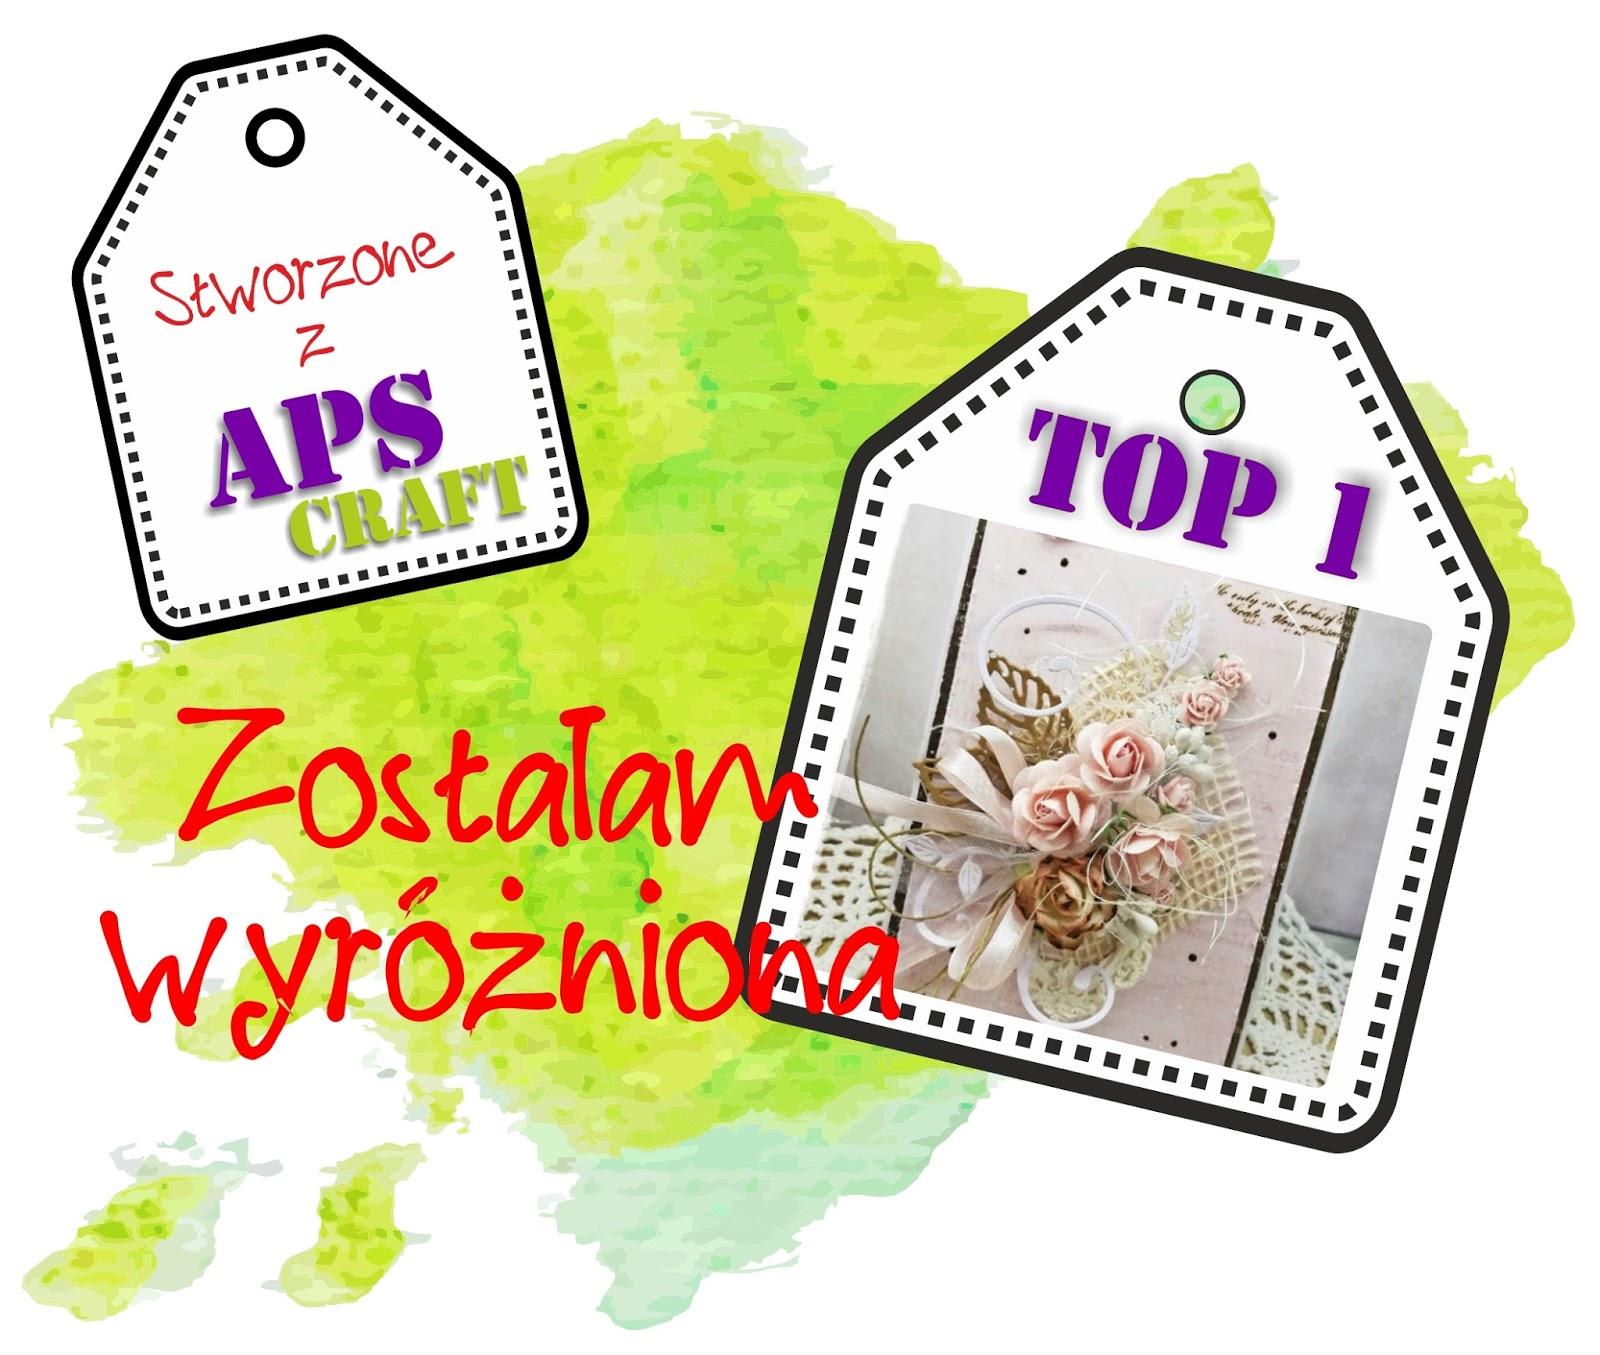 TOP 1 w APS